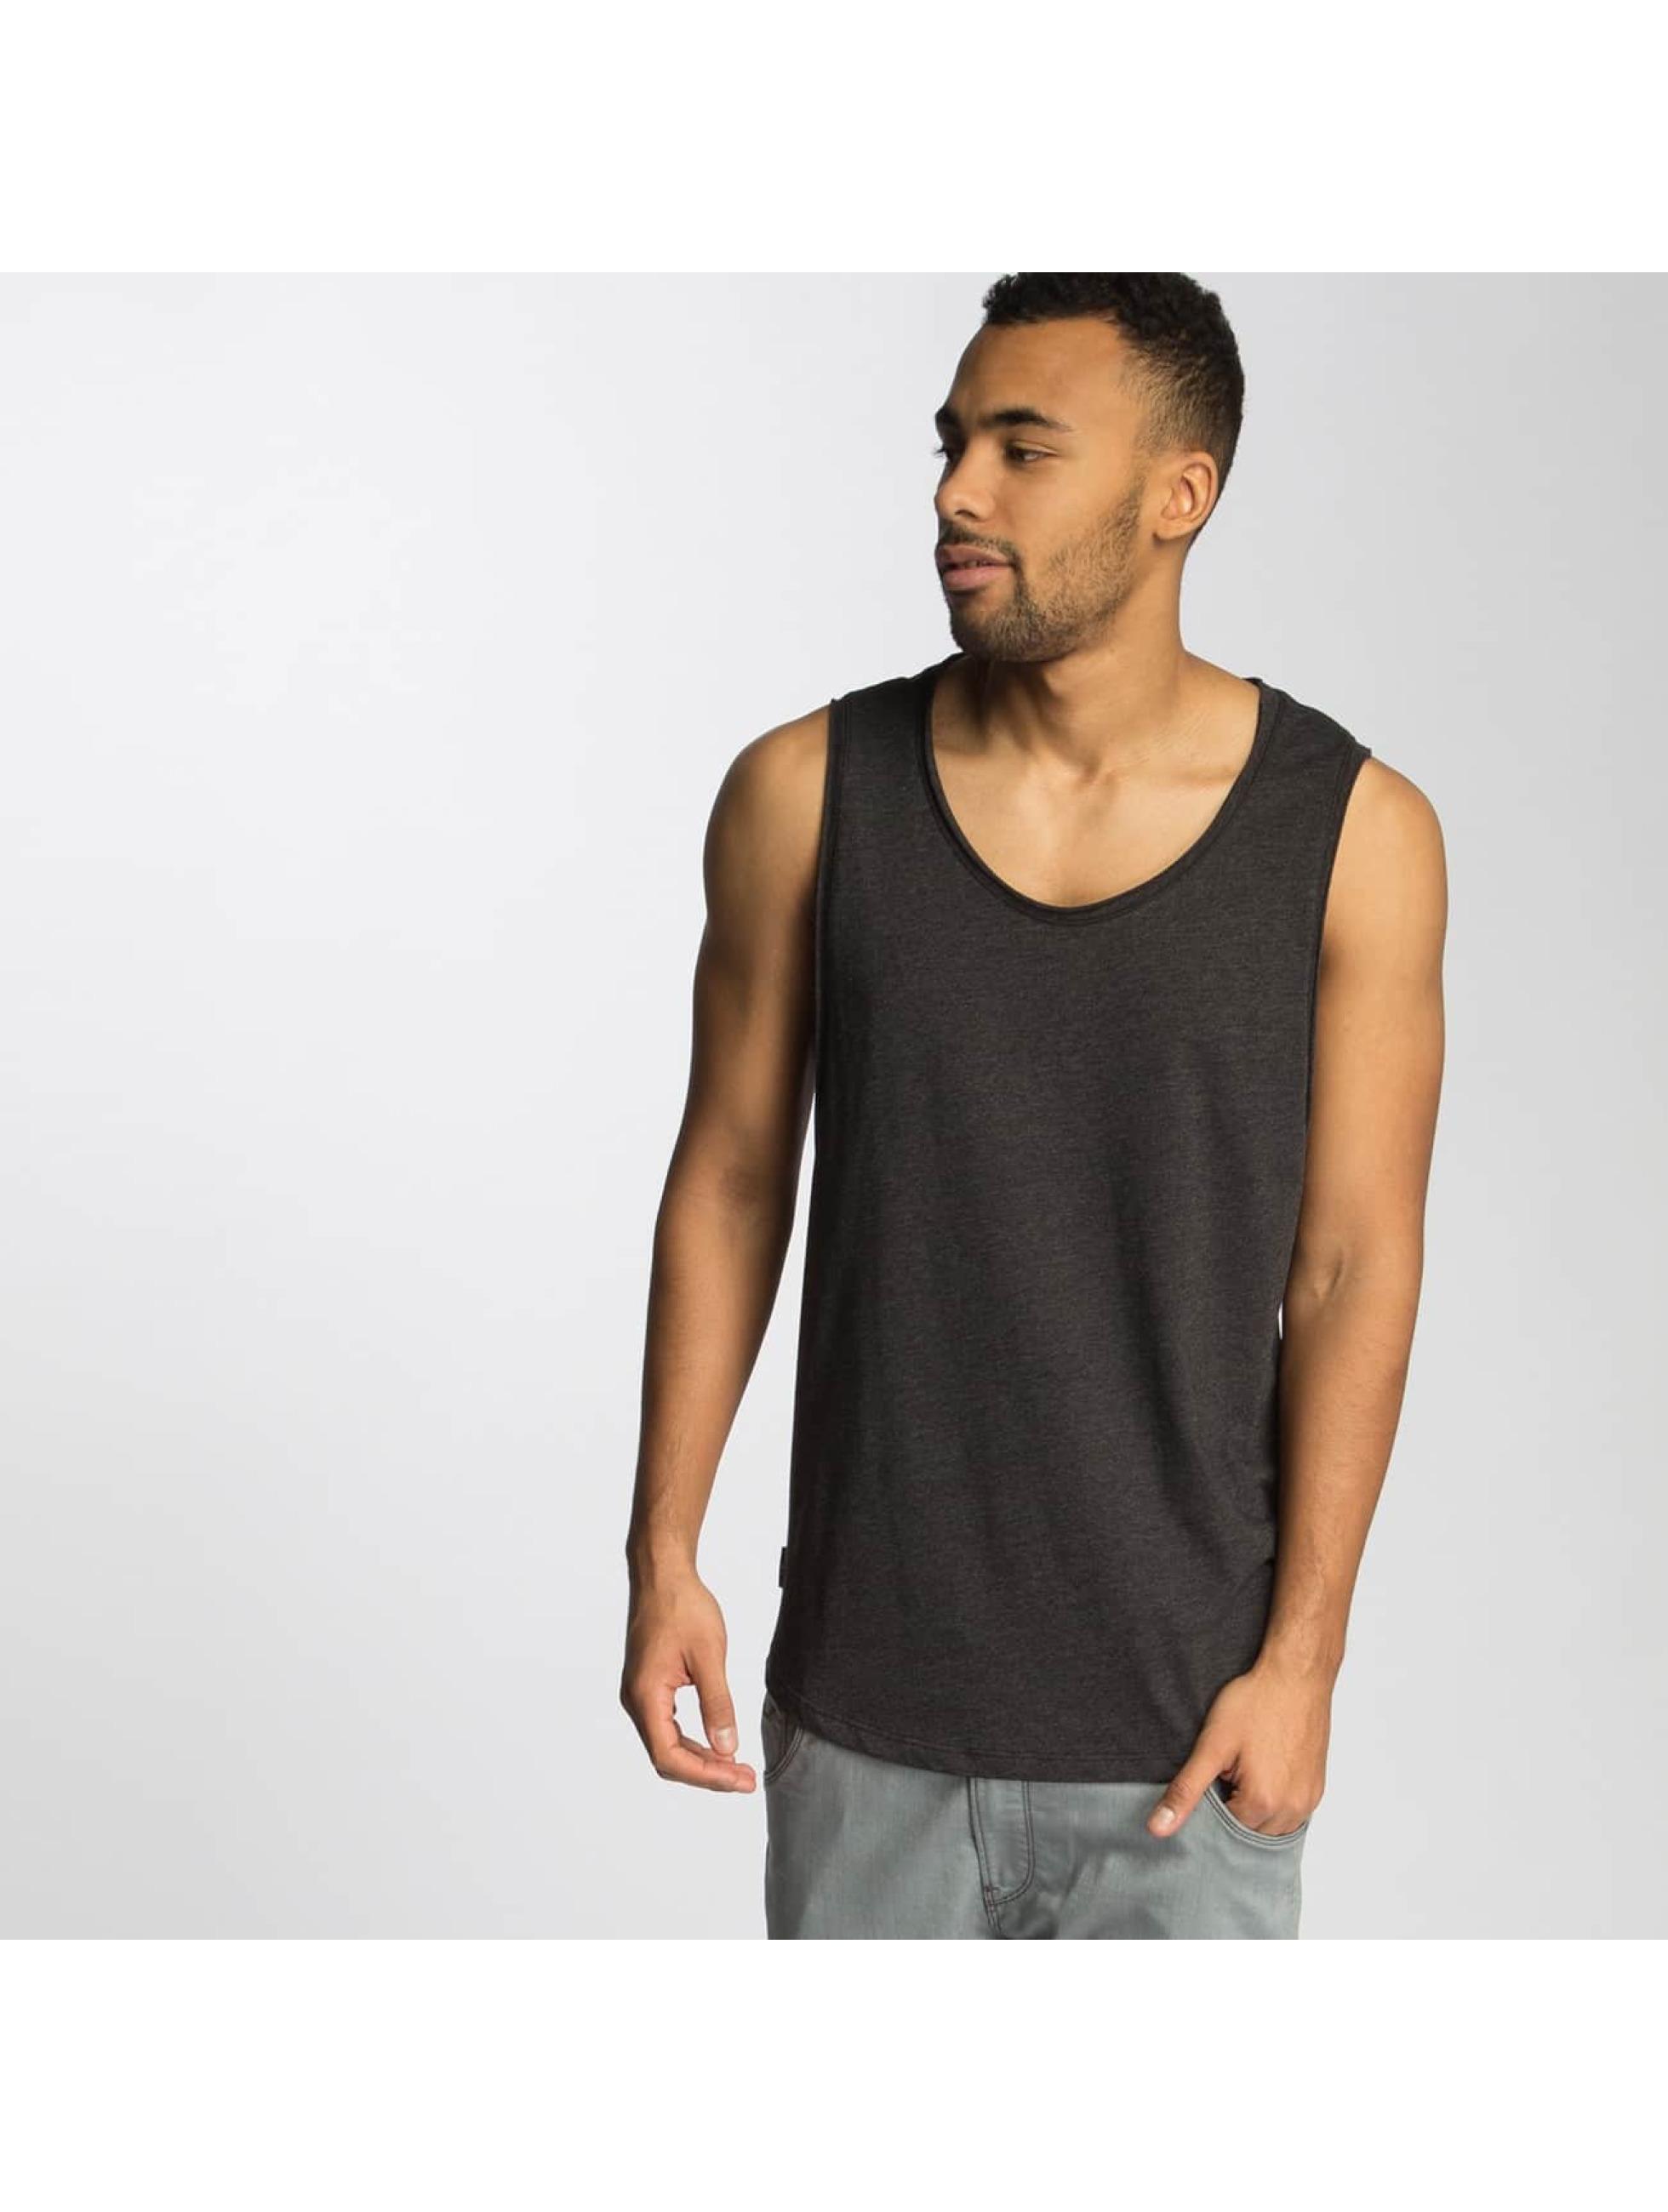 Rocawear / Tank Tops Basic in black S